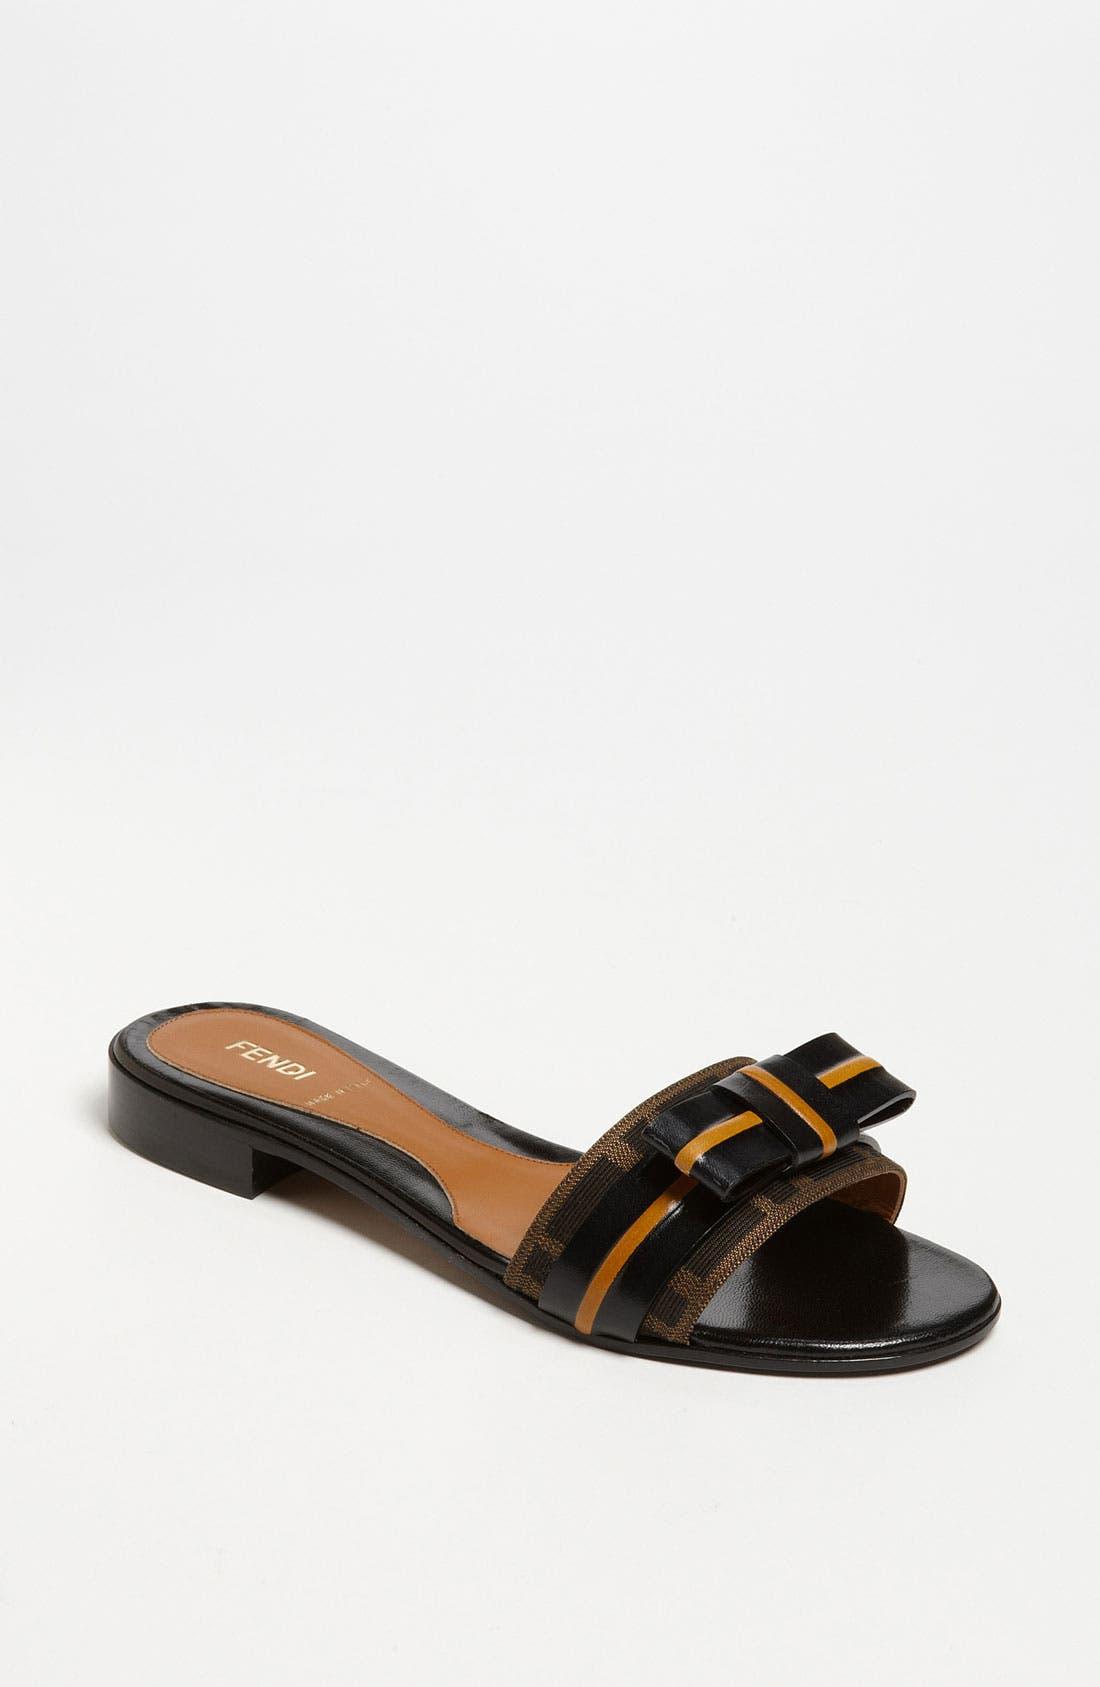 Main Image - Fendi 'Pride & Prejudice' Bow Slide Sandal